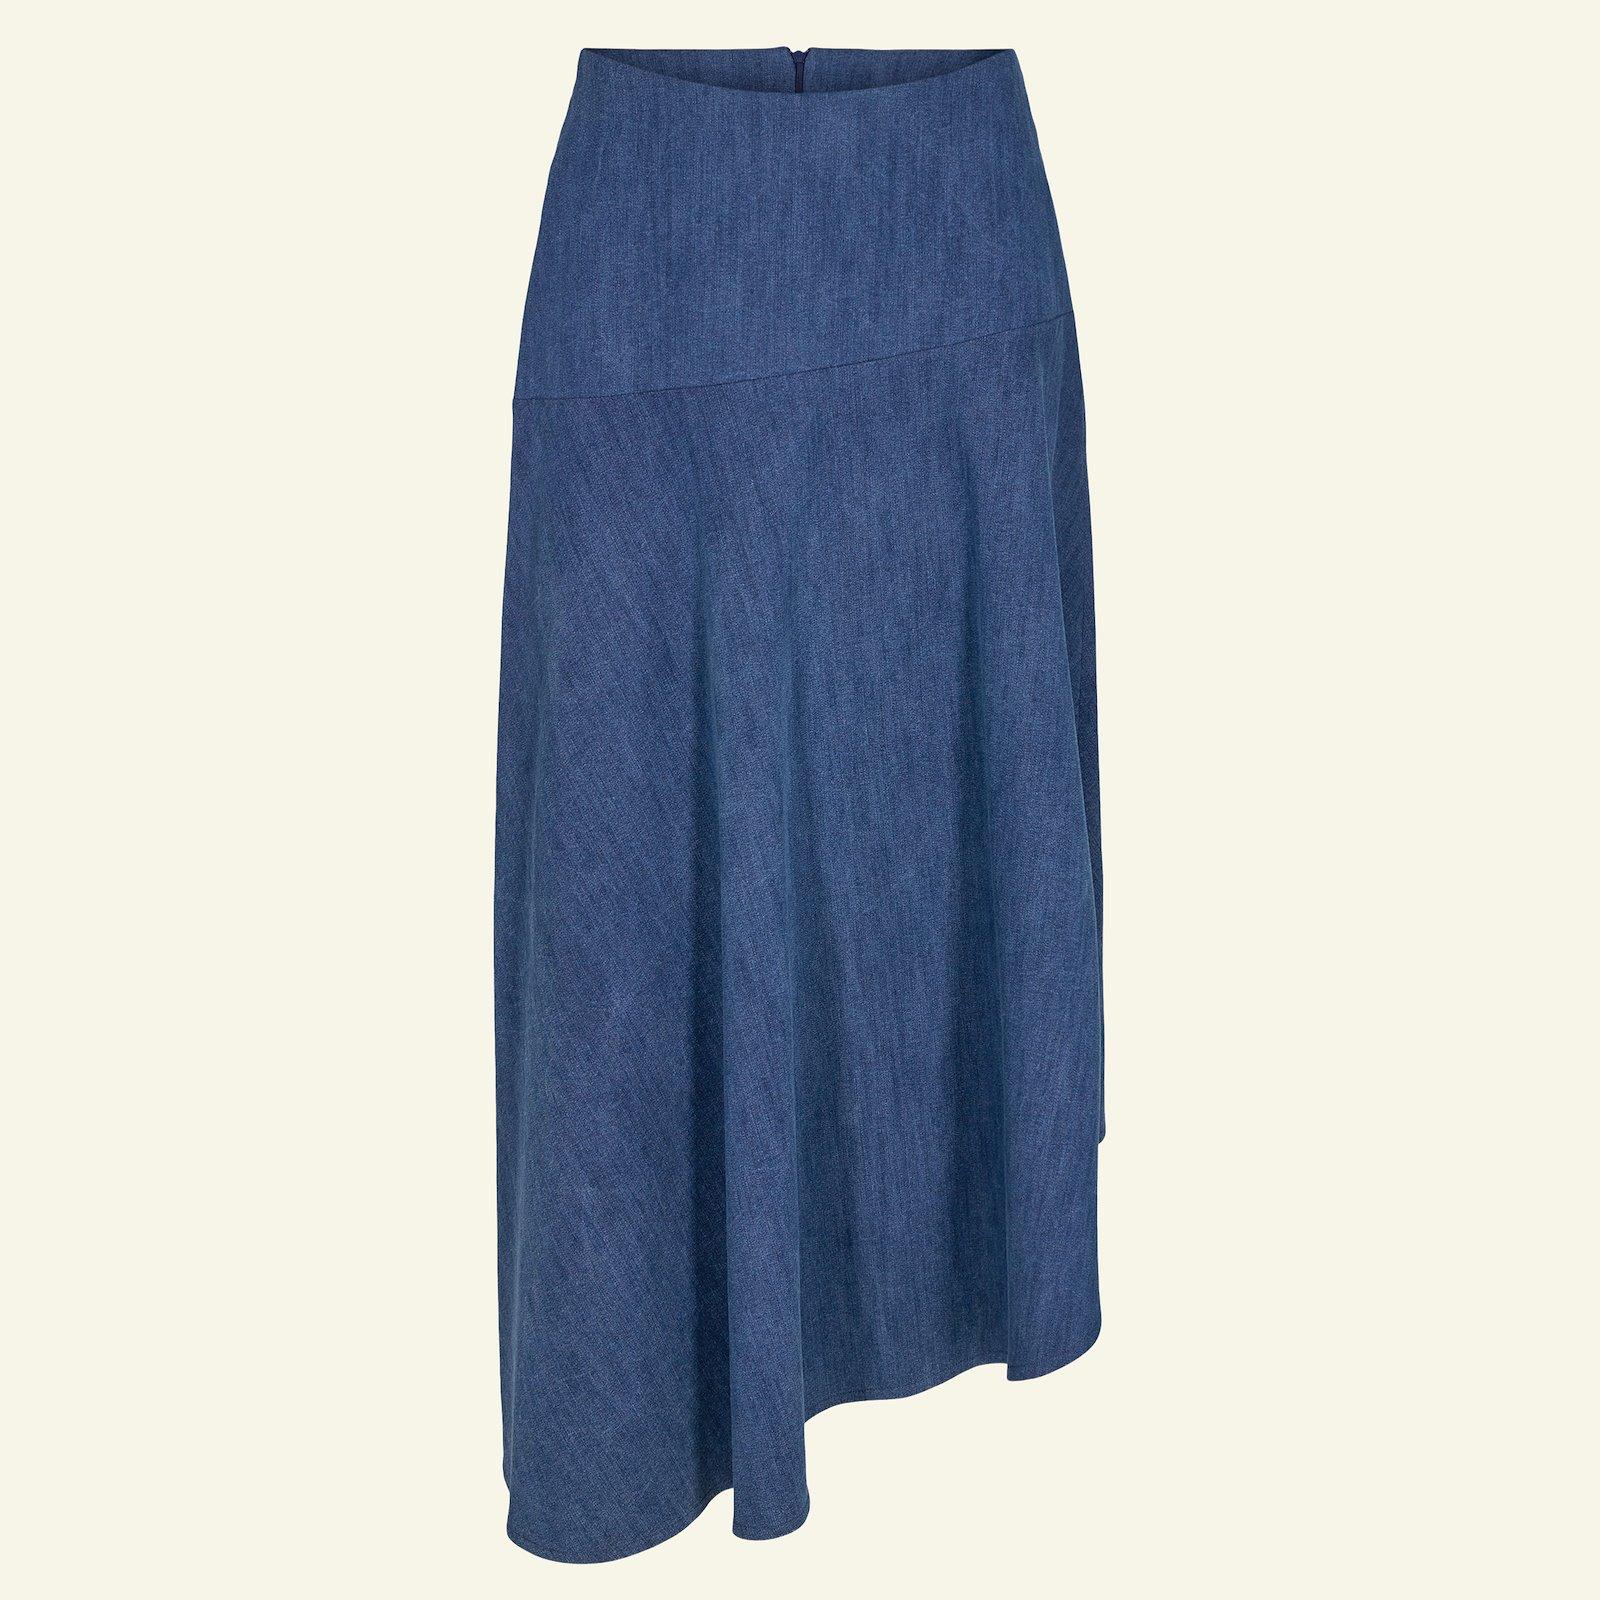 Asymmetric skirt, 38/10 p21041_460851_sskit